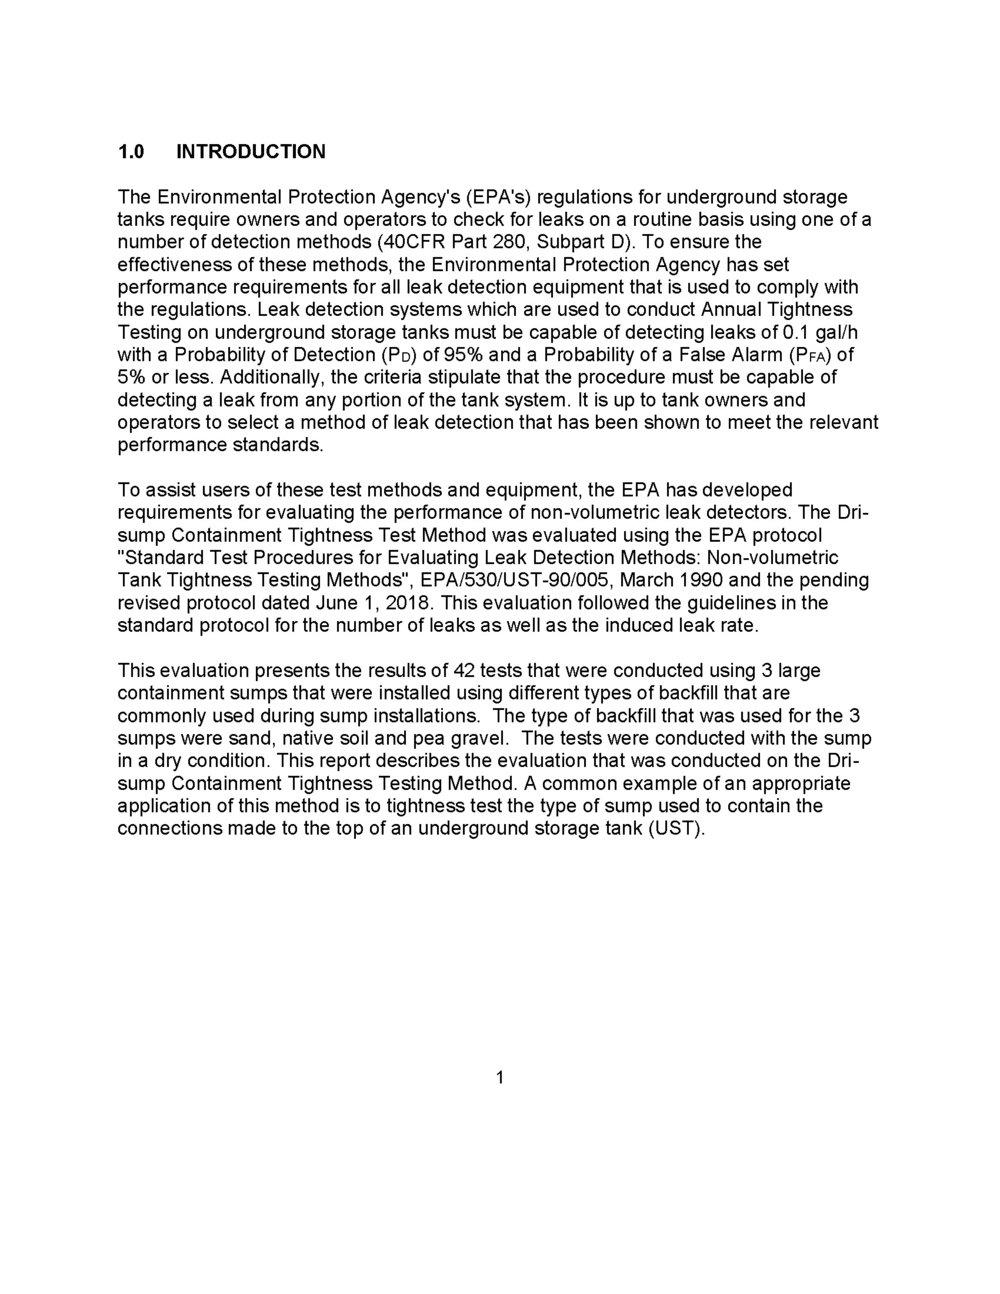 KWA Final Report Dri Sump 12 19 2018_Page_05.jpg